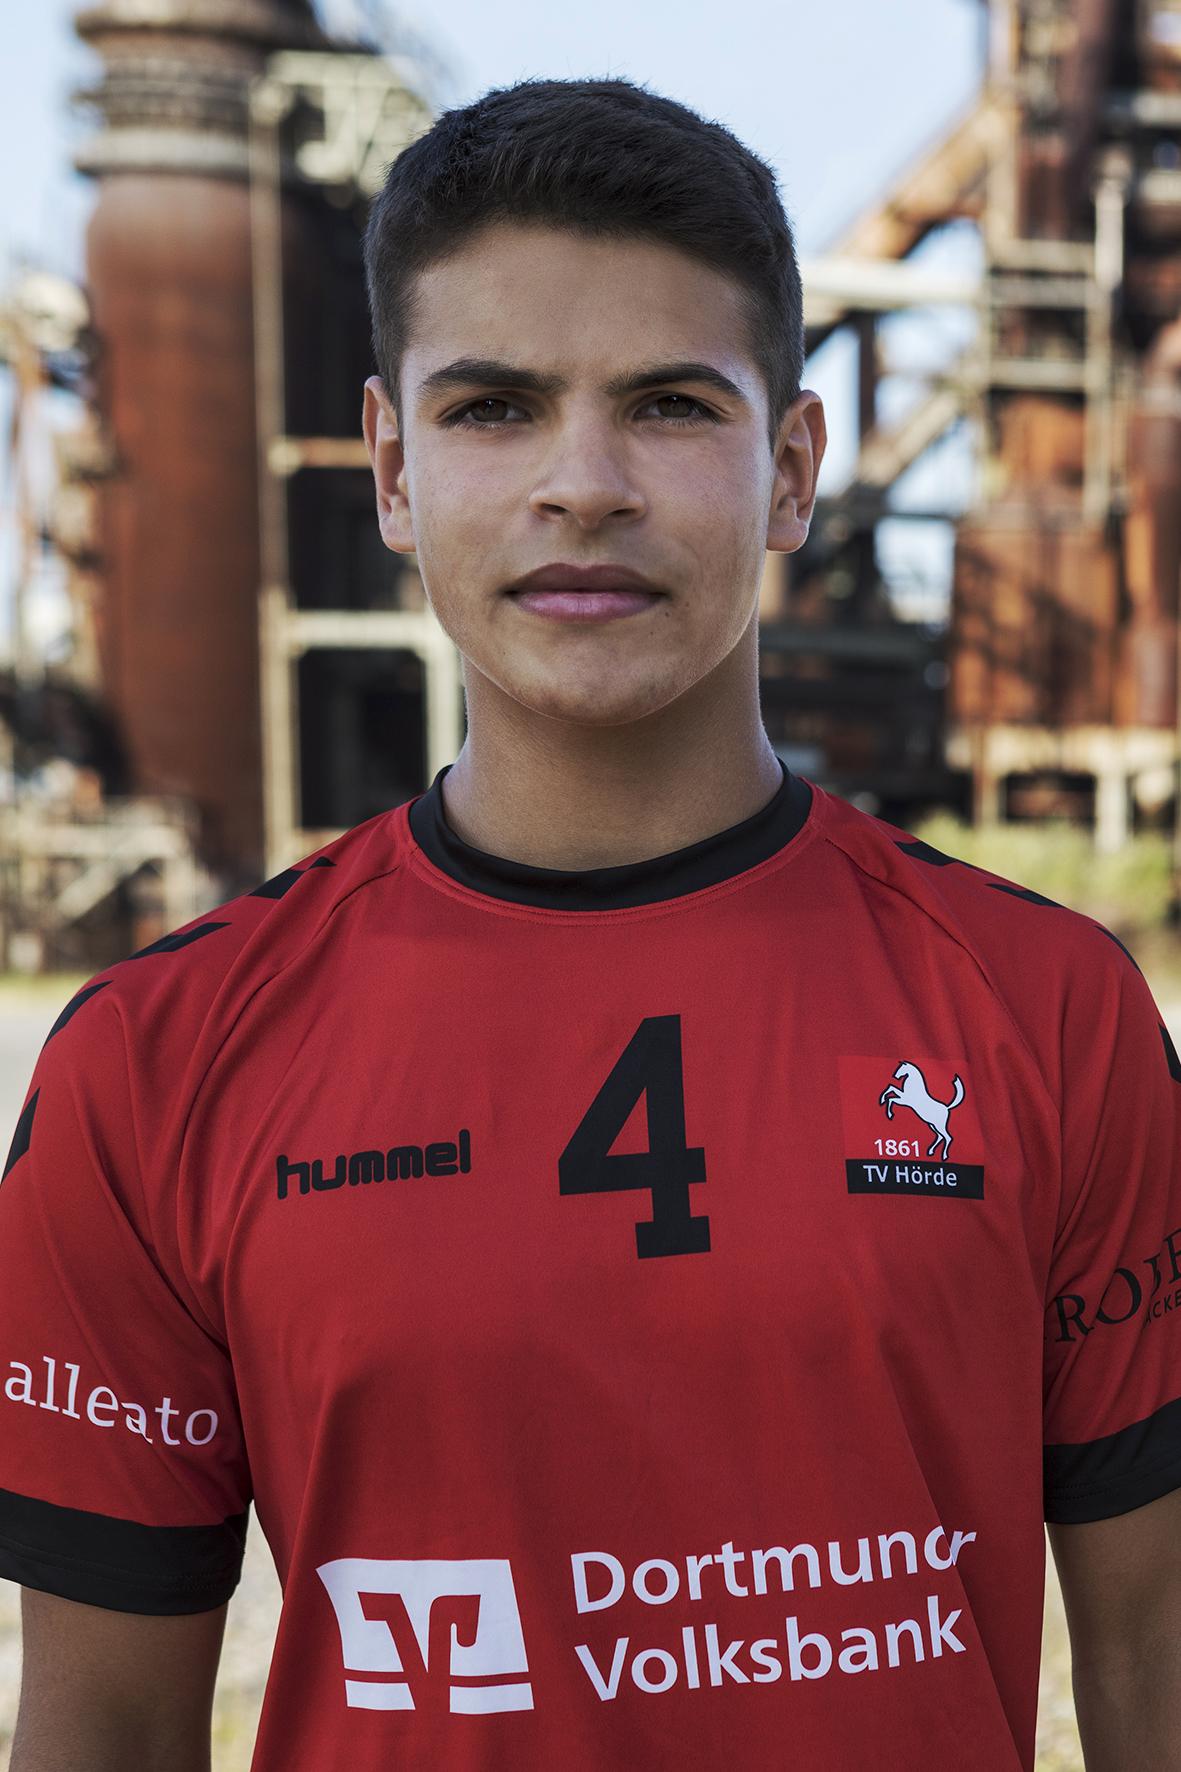 4 - Lukas Salimi